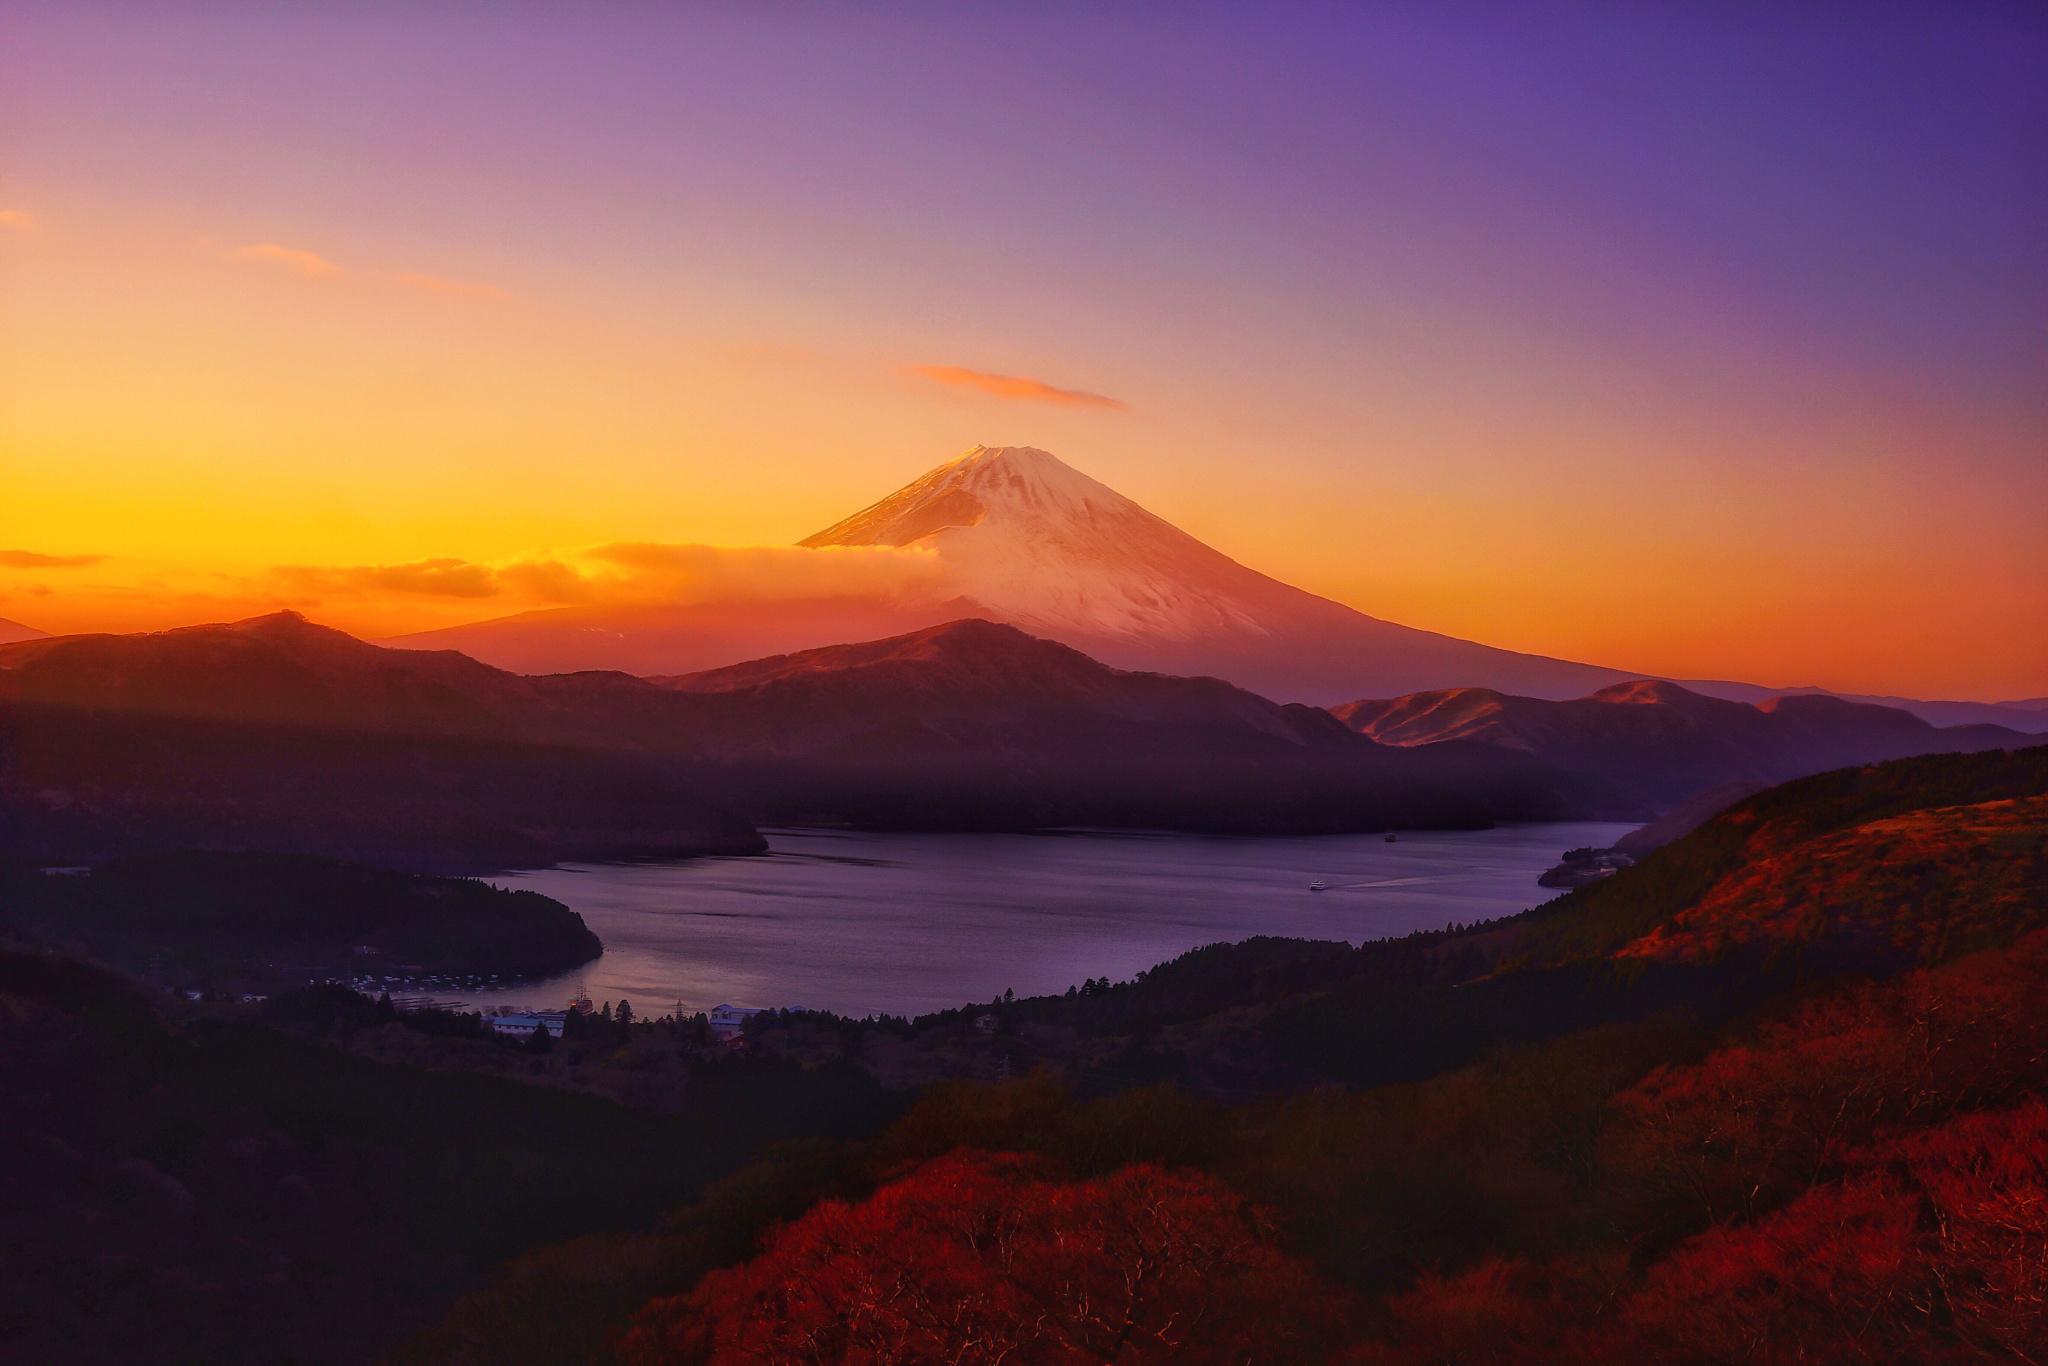 Popular Wallpaper Mountain Horizon - mountains-sunset-hill-sky-sunrise-evening-morning-horizon-dusk-plateau-mountain-dawn-distance-loch-afterglow-mountainous-landforms-landform-red-sky-at-morning-561424  Snapshot_30685.jpg